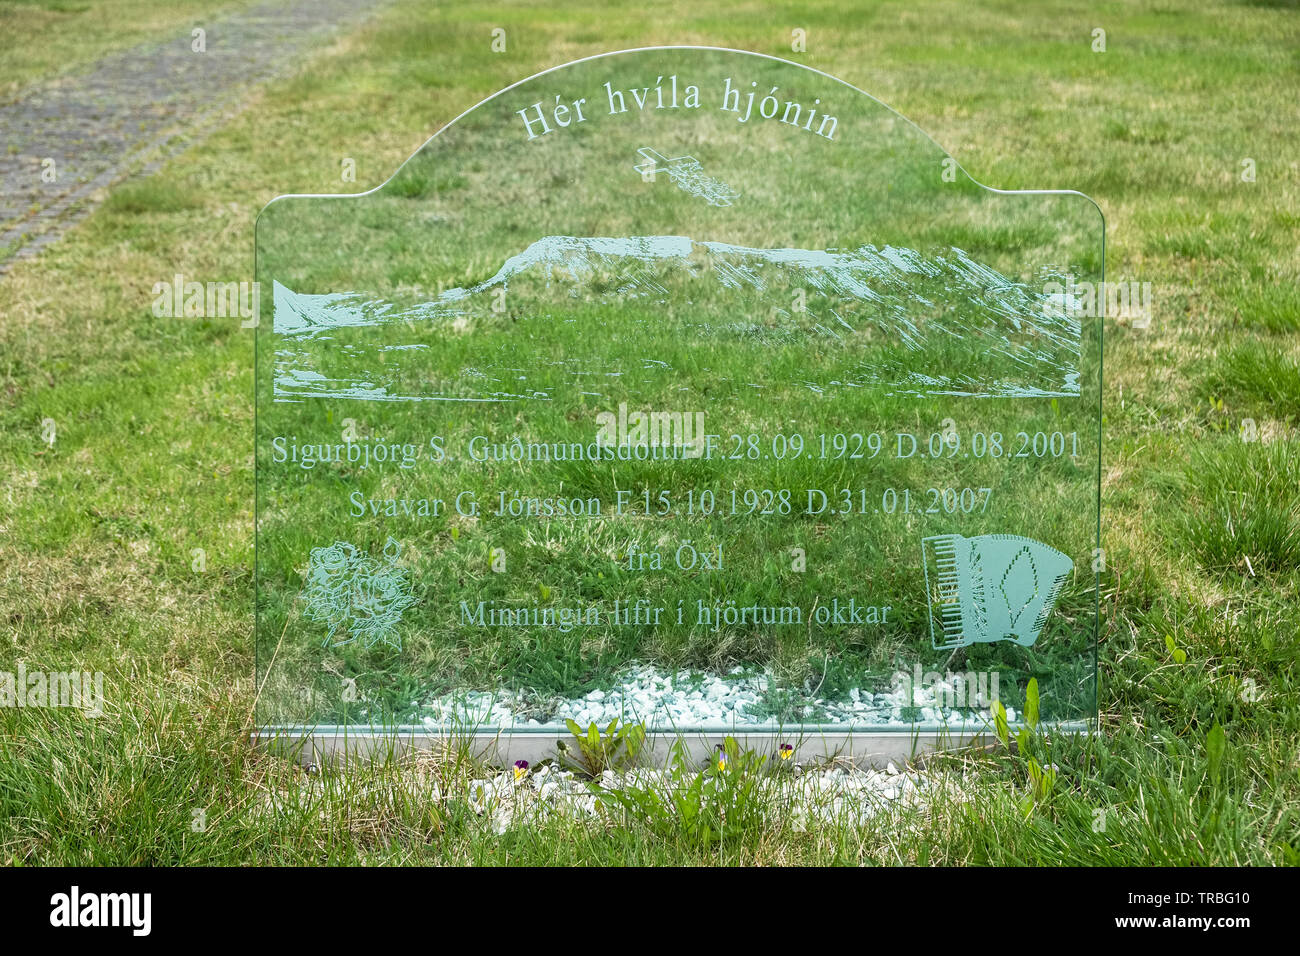 An etched plate glass gravestone at Þingeyrakirkja Church, near Blonduos in north Iceland - Stock Image